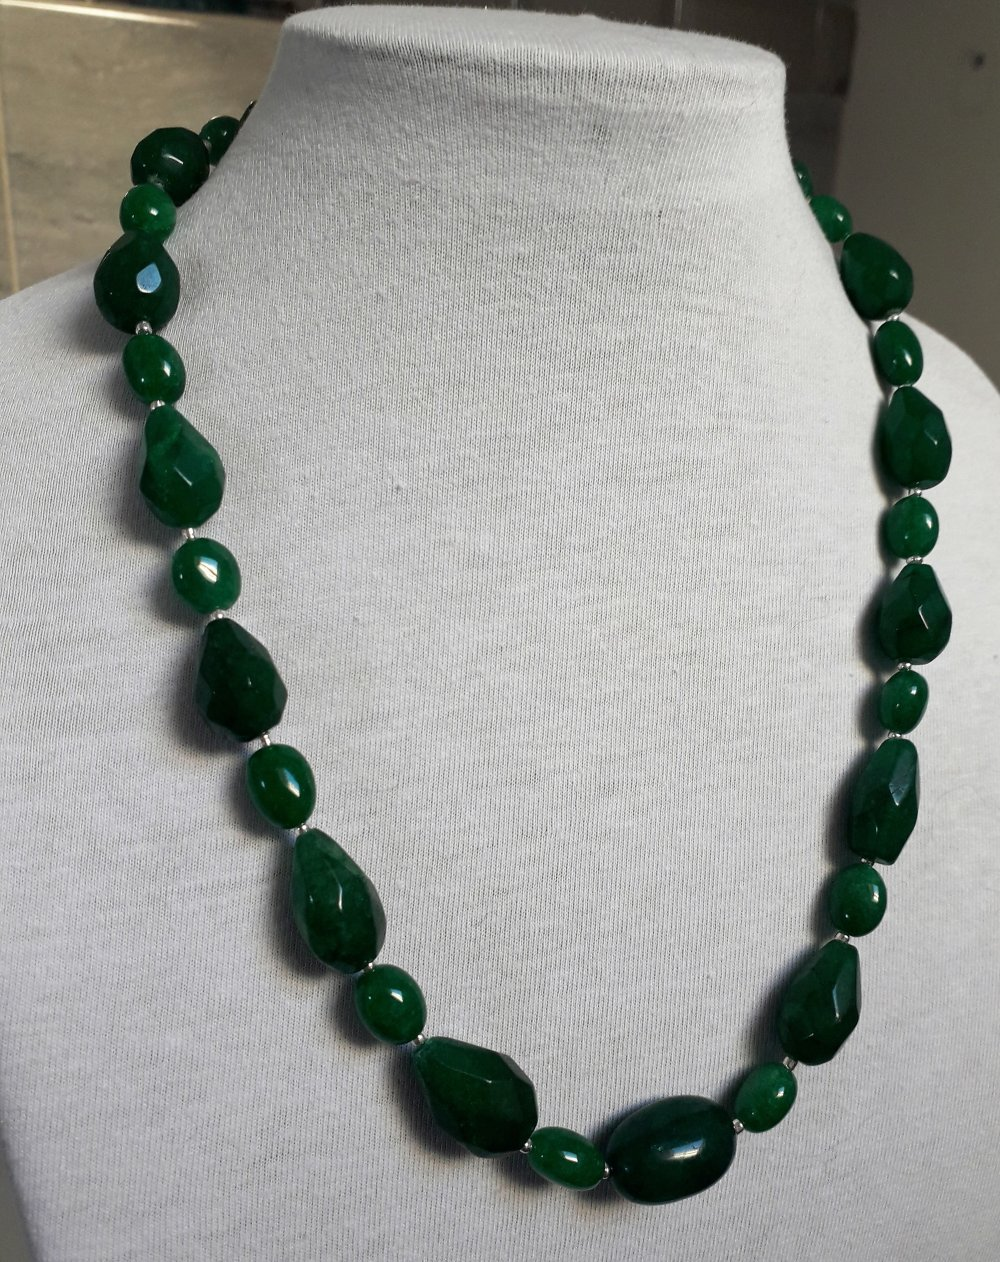 collier en pierre d'émeraude opaque naturelle